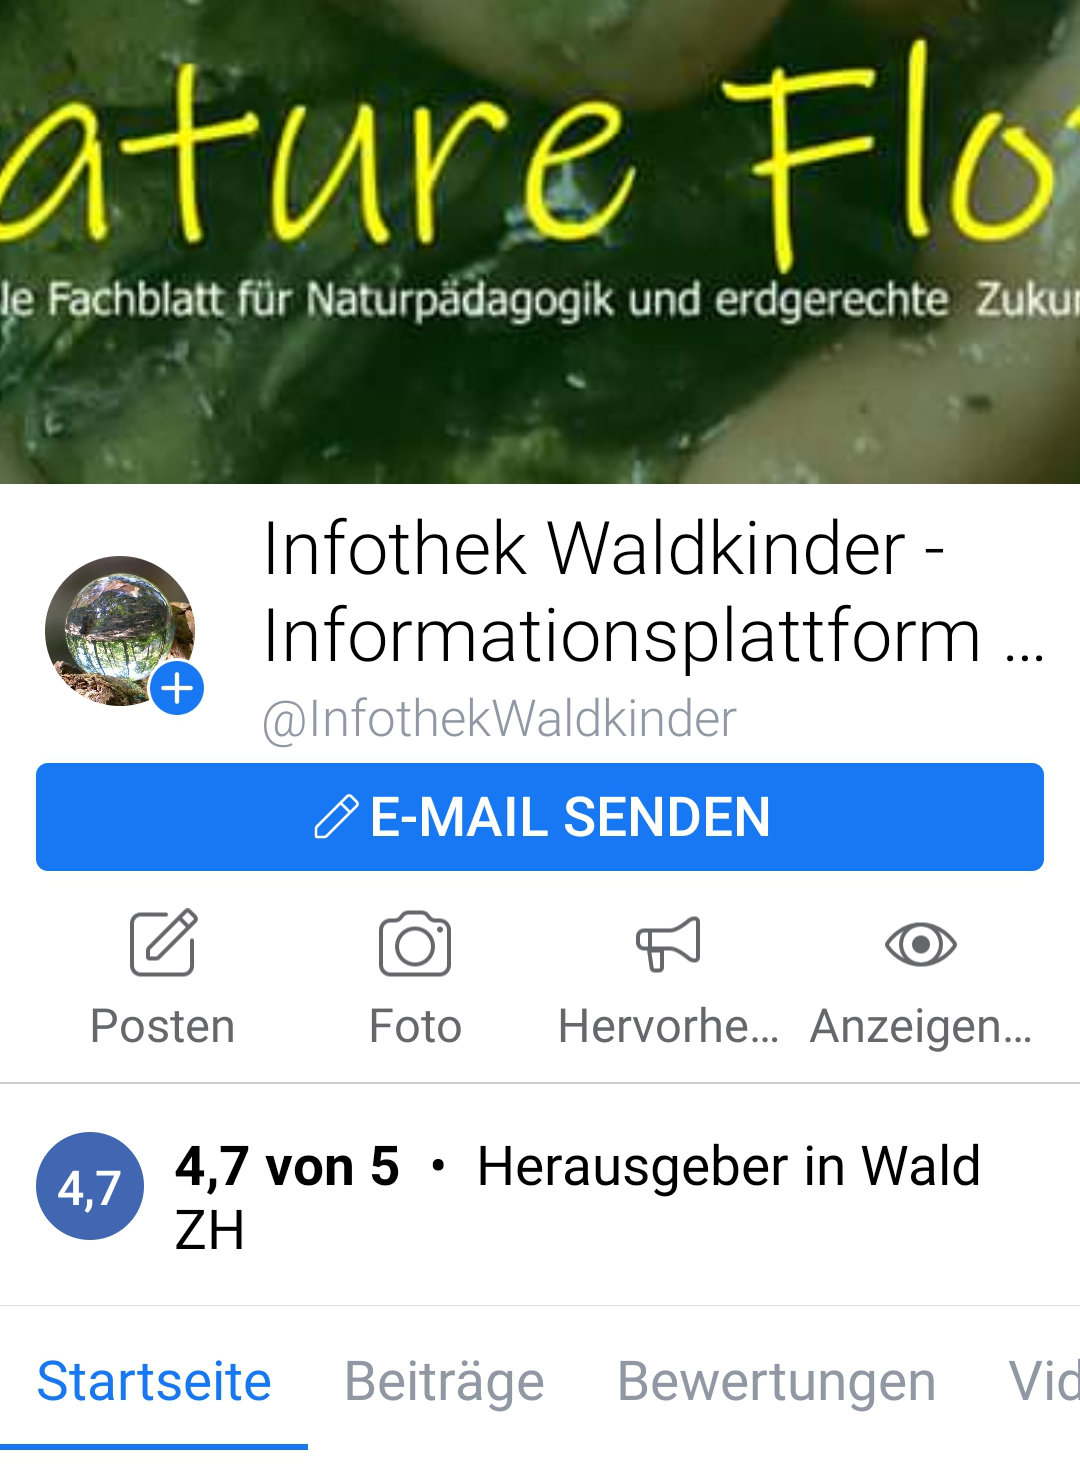 Das Fachblatt auf Social Media Infothek Waldkinder